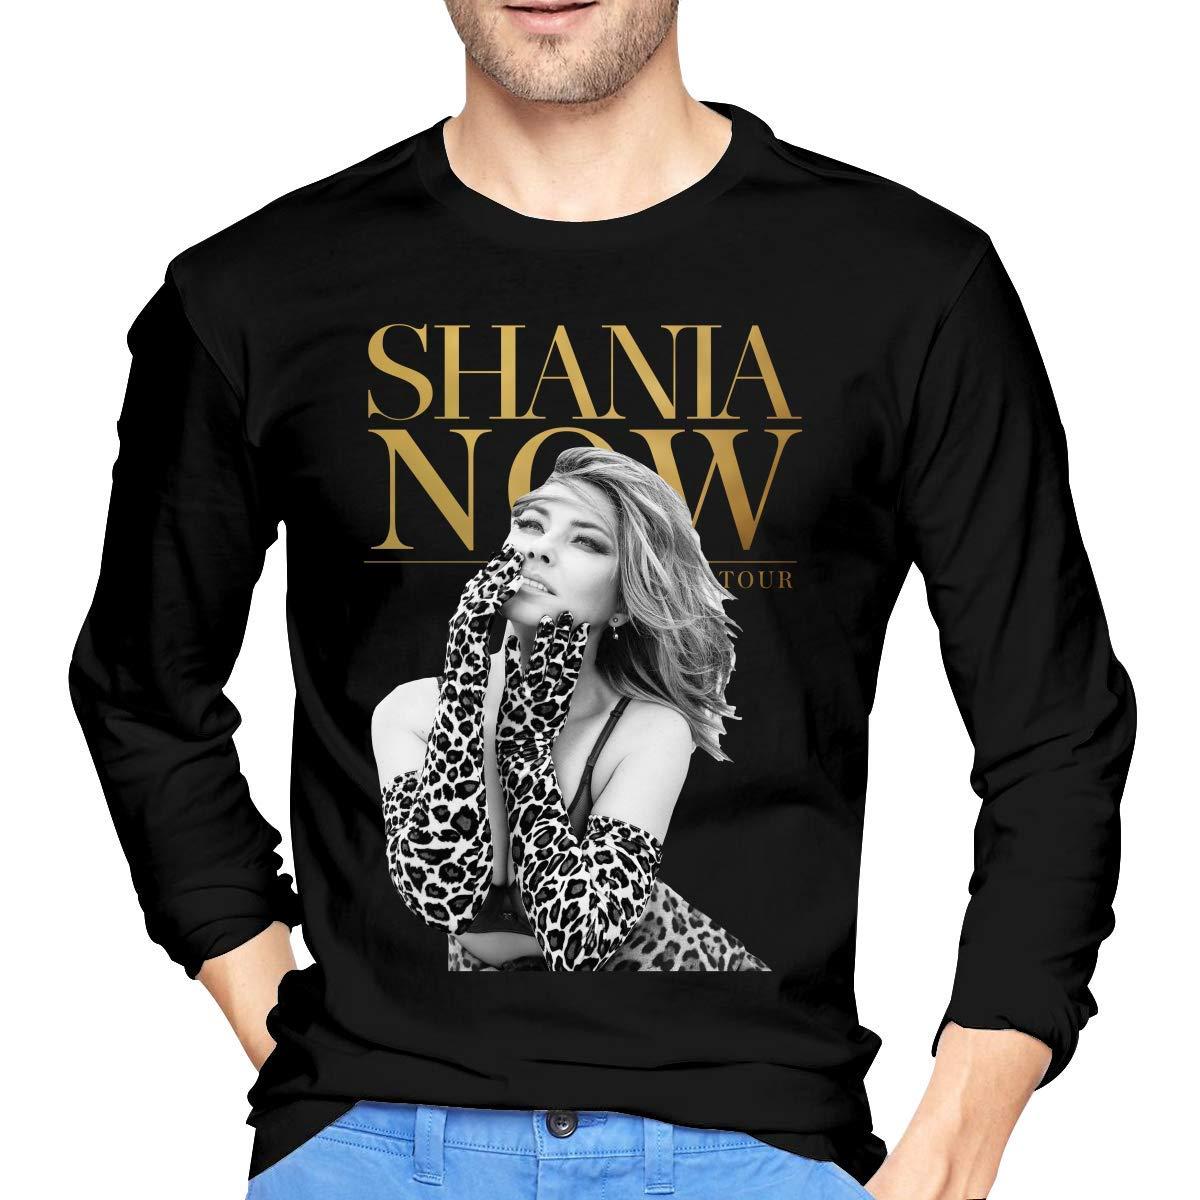 Fssatung S Shania Twain Now Tee Black Shirts